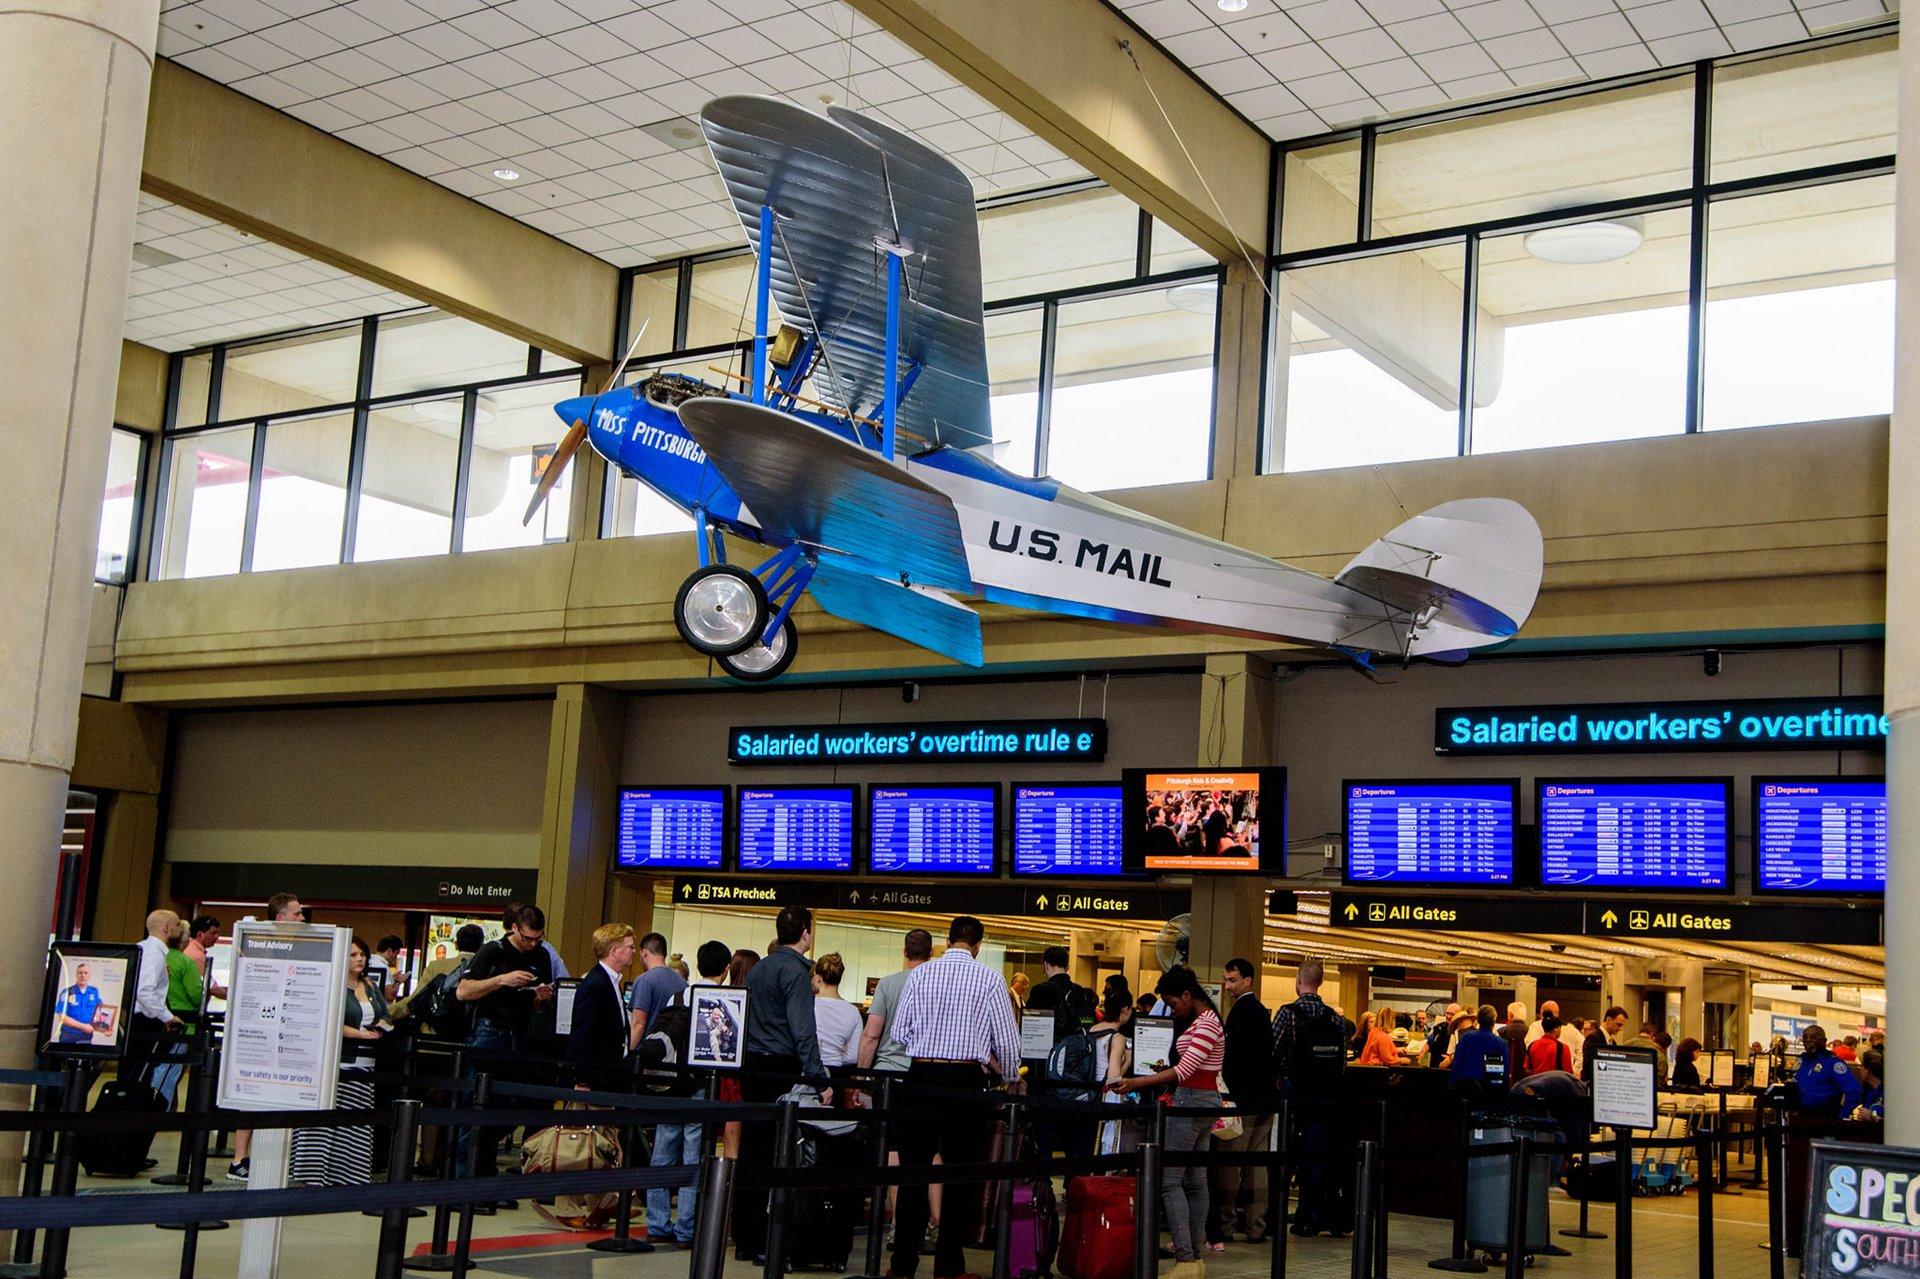 TRAVEL ADVISORY: Nearly 250,000 expected to travel through Pittsburgh International Nov. 20-27